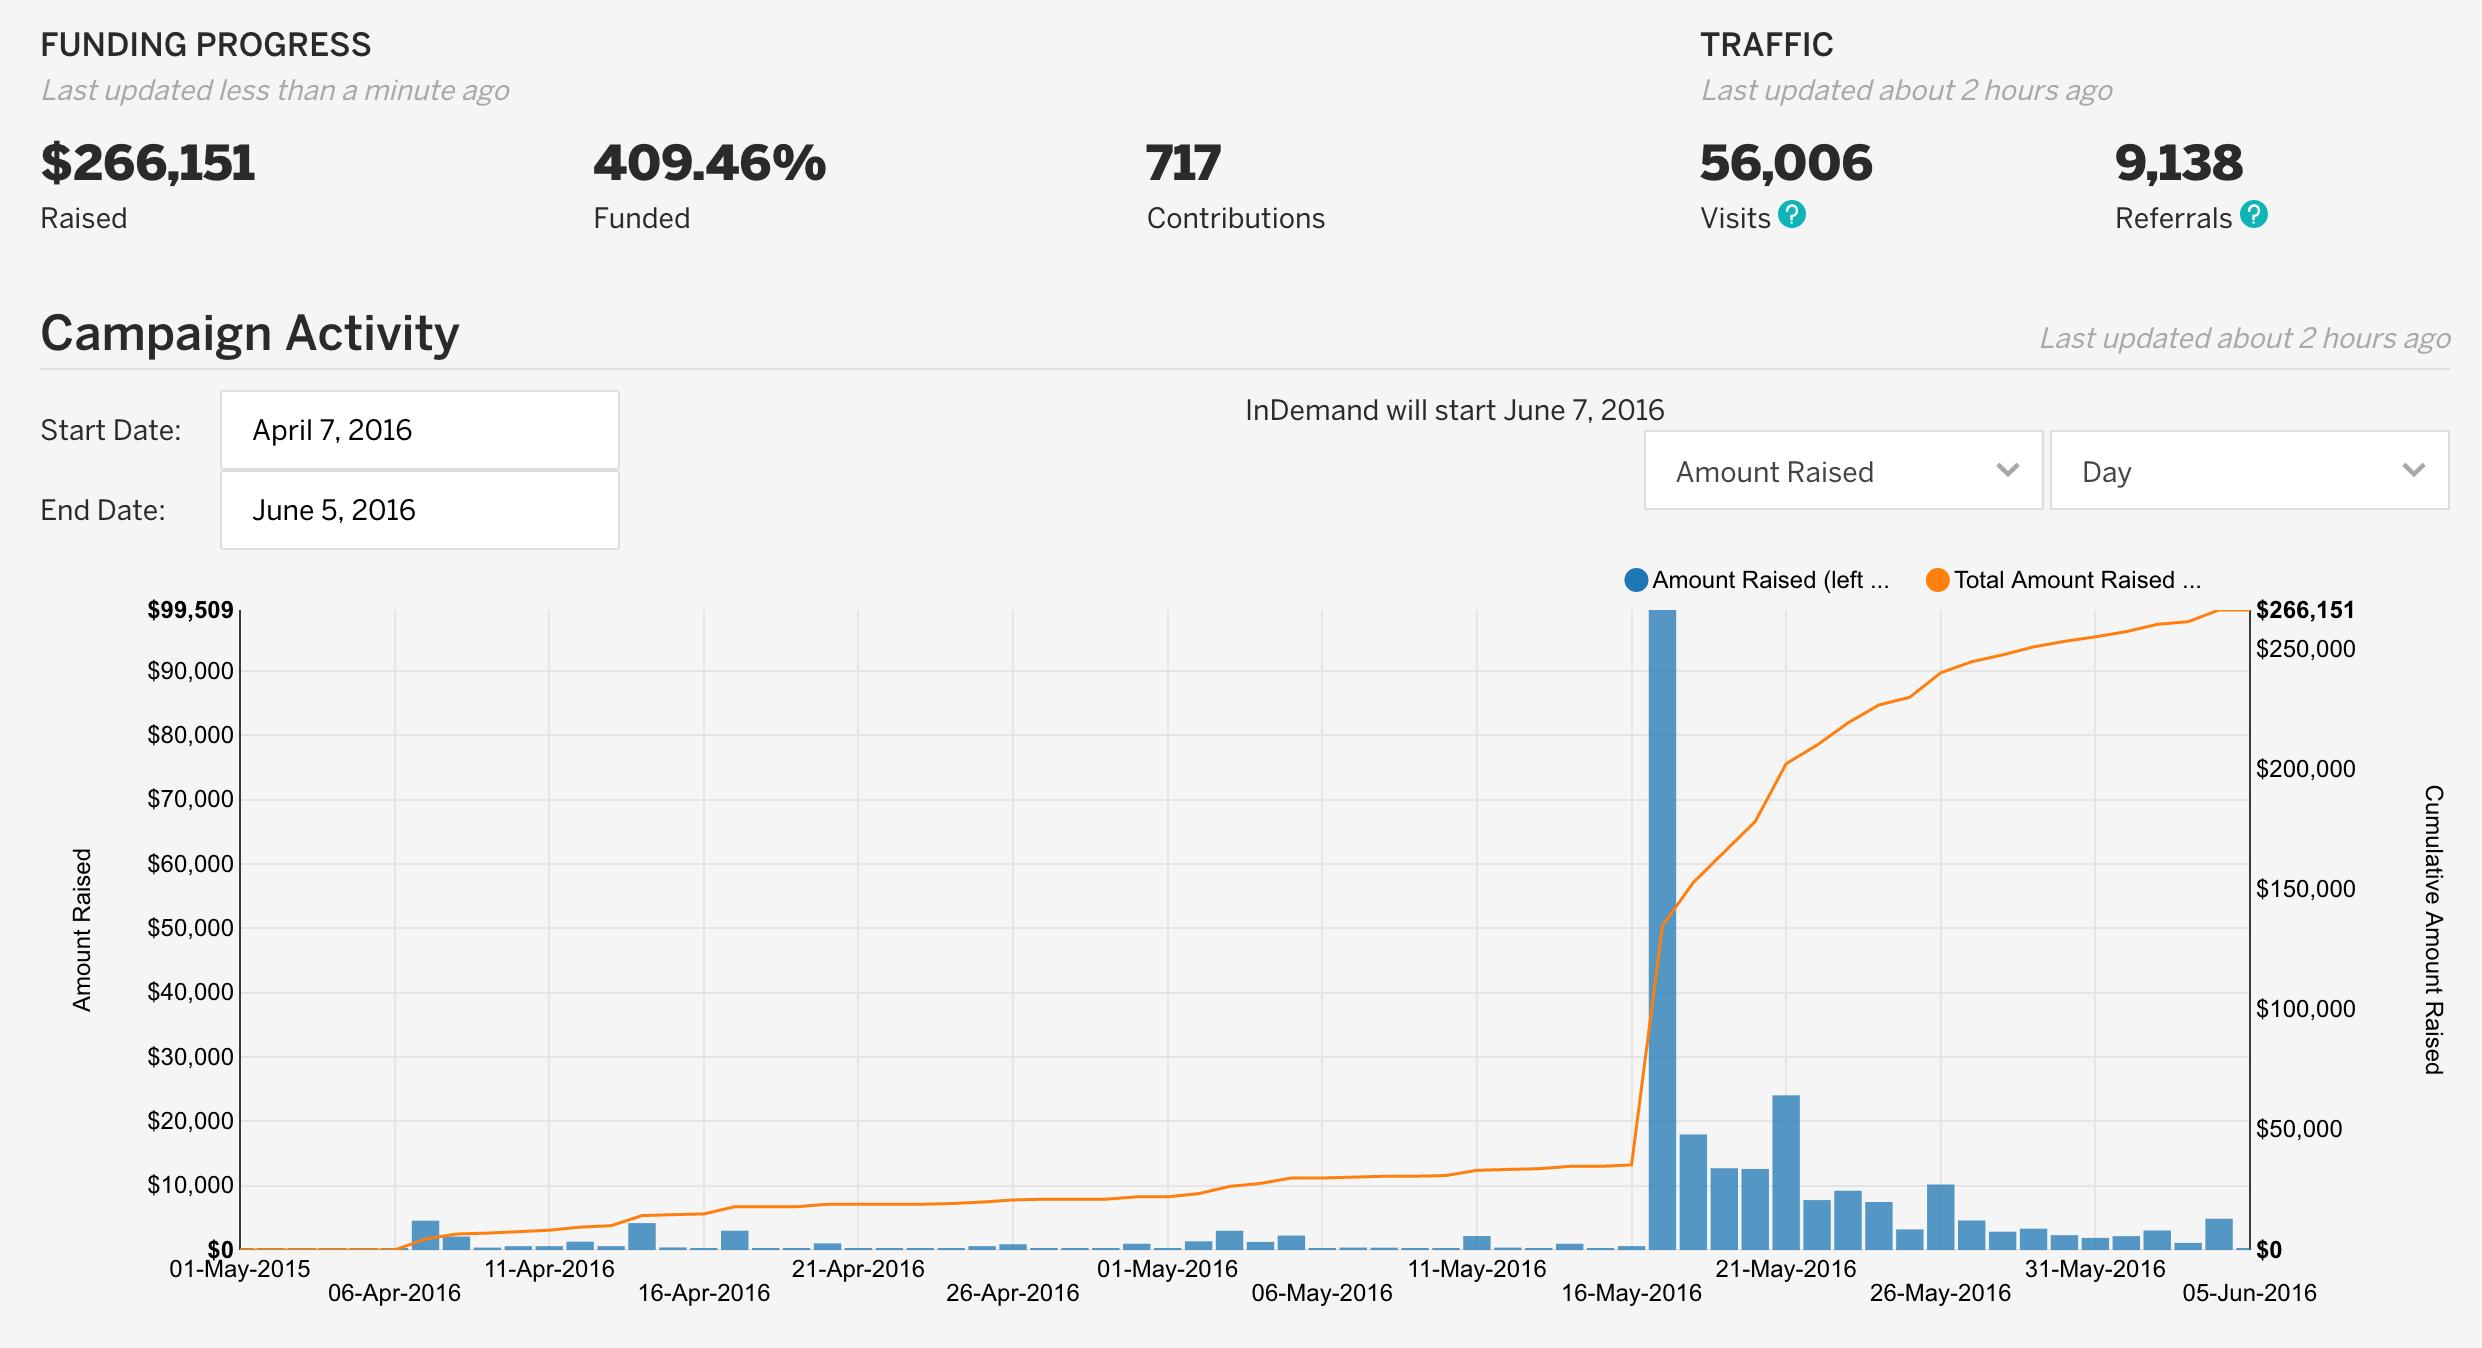 VerteCore Technologies Soars 410% Past Indiegogo Crowdfunding Goal